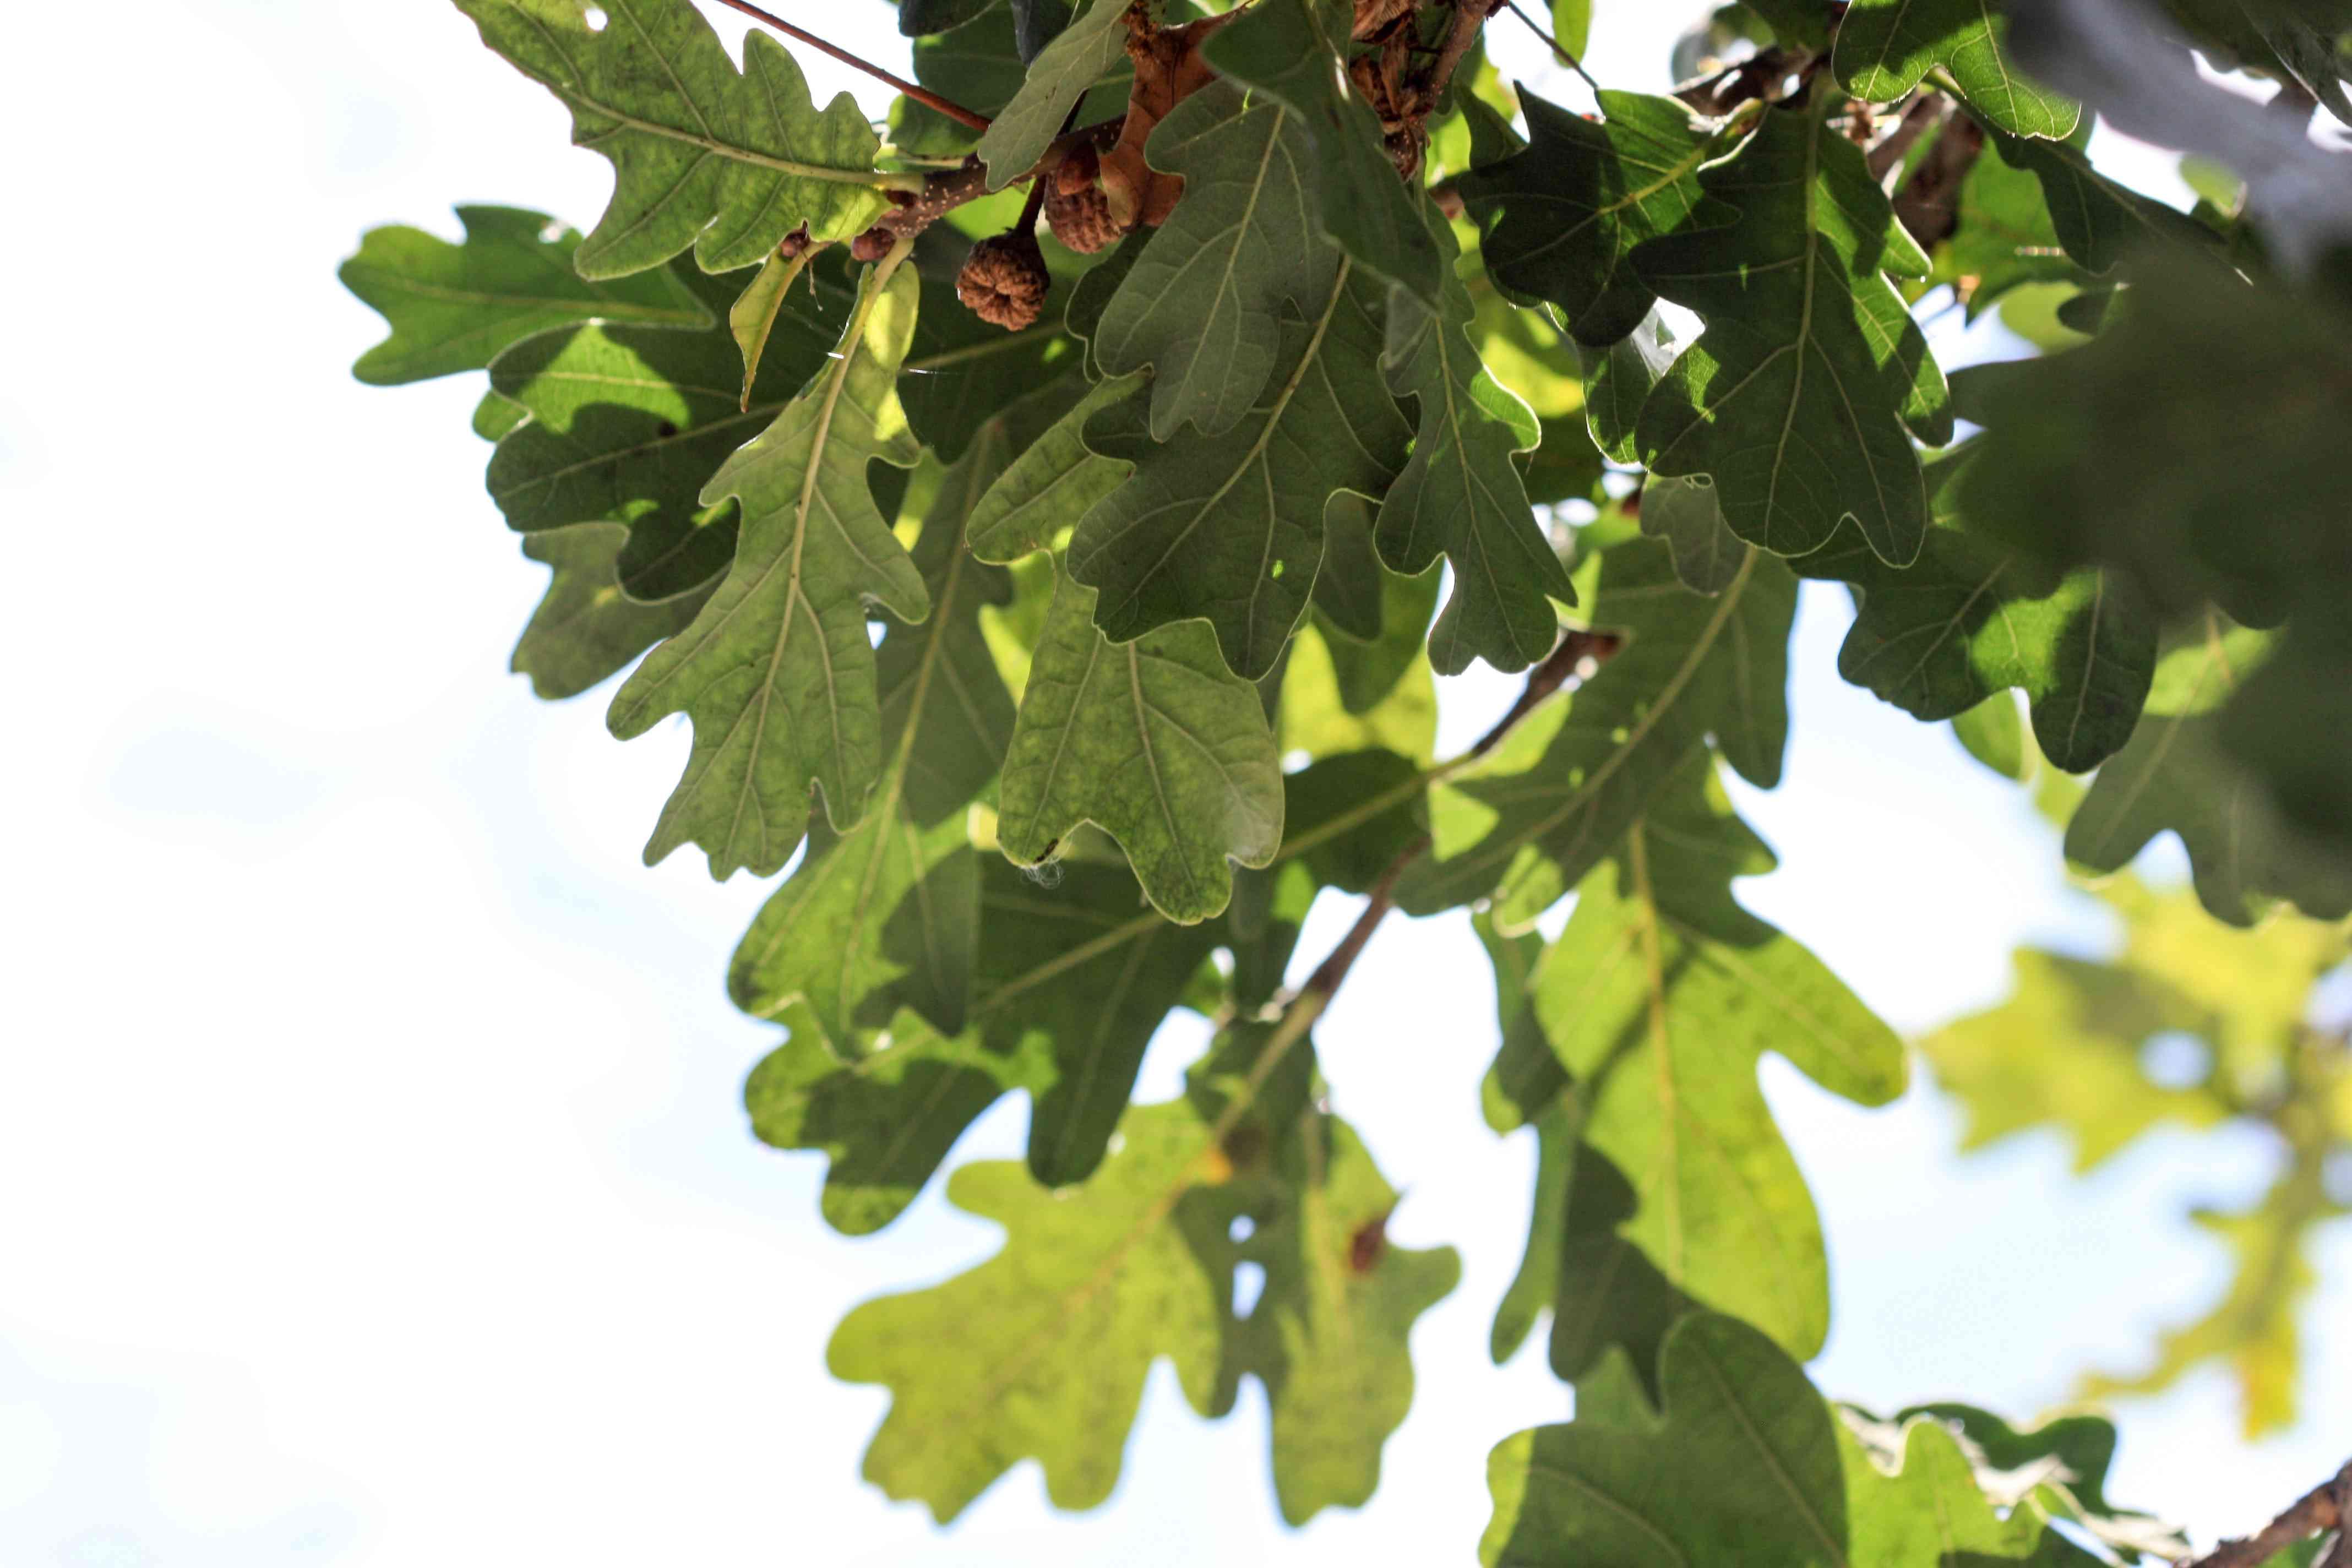 White Oak leaves hanging against a blue sky.